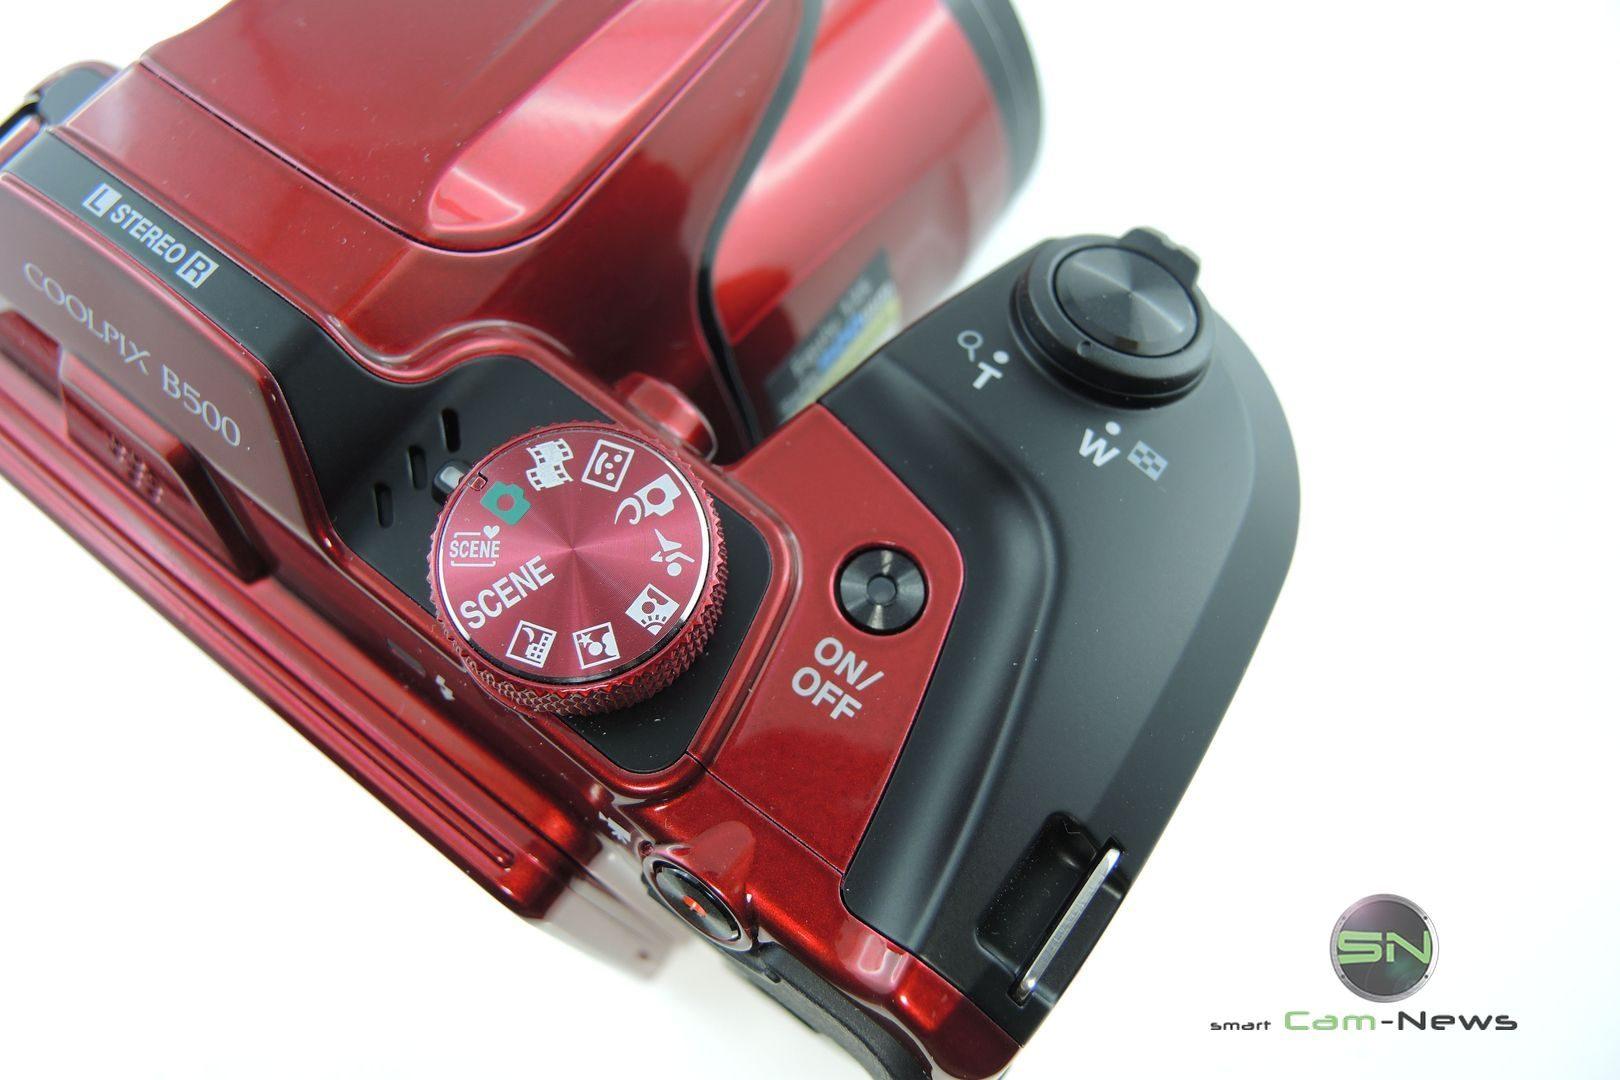 iaut-und-szene-menue-nikon-b500-smartcamnews